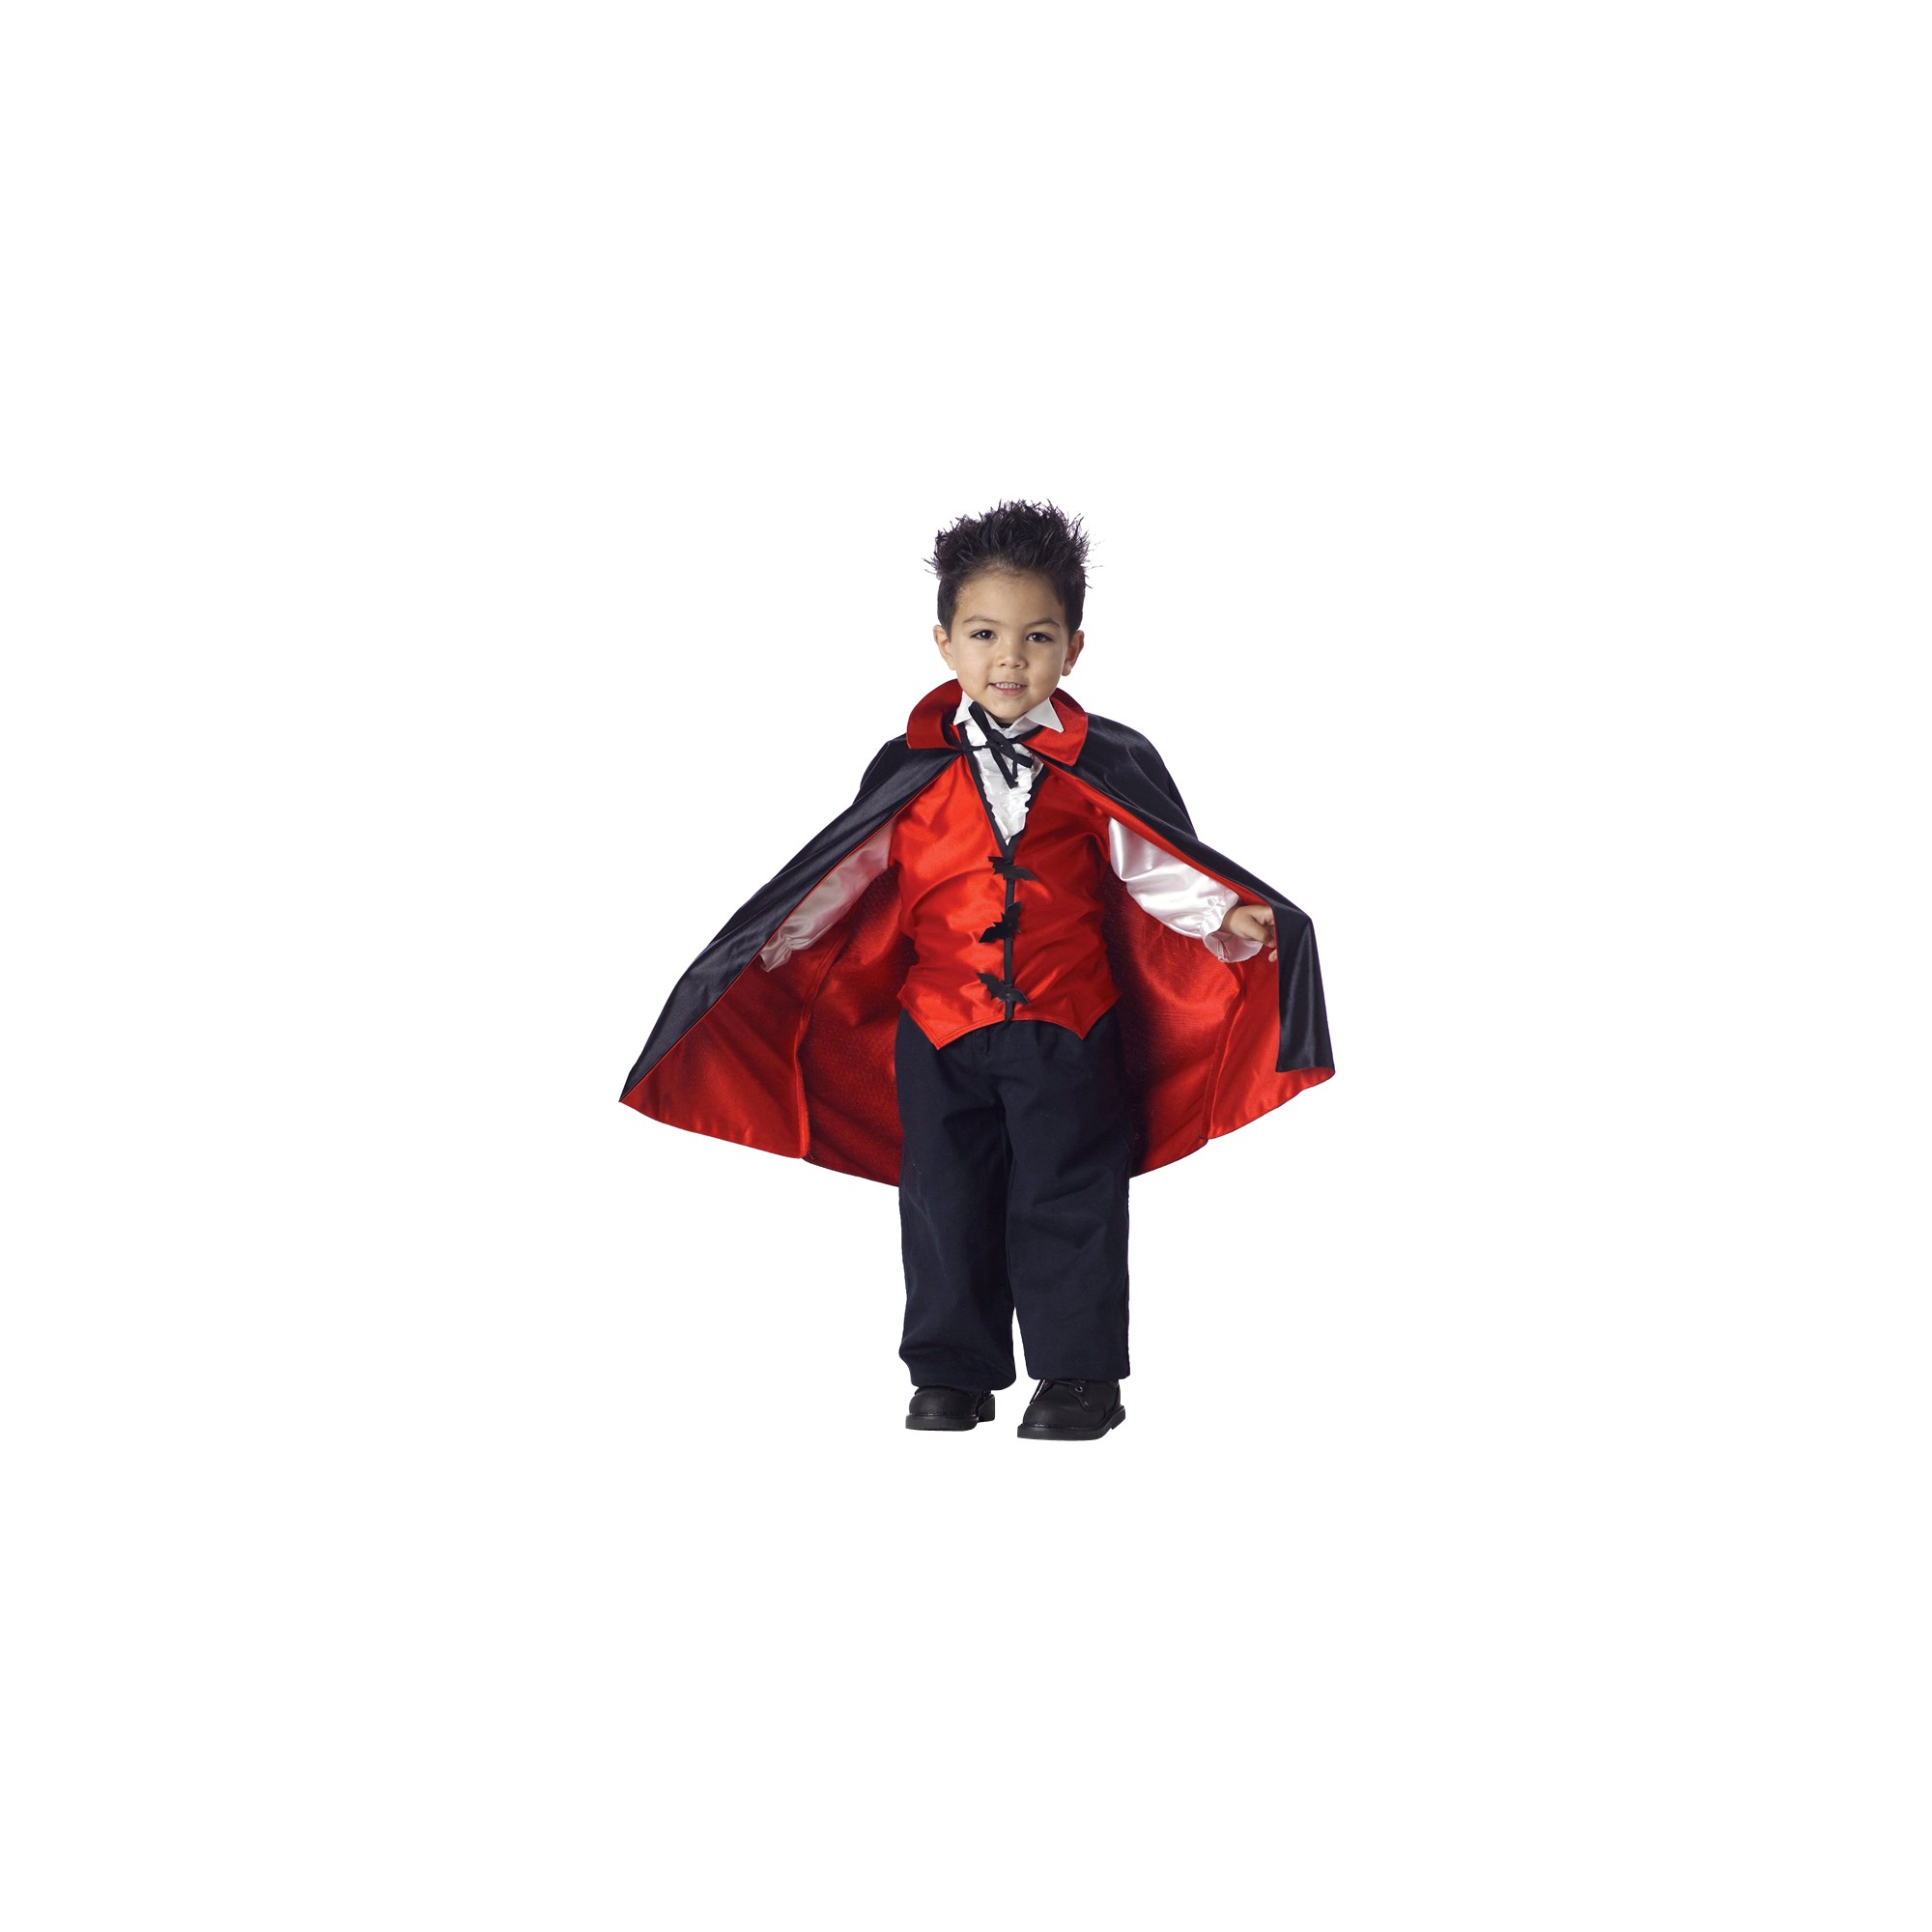 Halloween Toddler Boysu0027 V&ire Costume 2T-4T  sc 1 st  Pinterest & Toddler Boysu0027 Vampire Costume 2T-4T | Pinterest | Vampire costumes ...